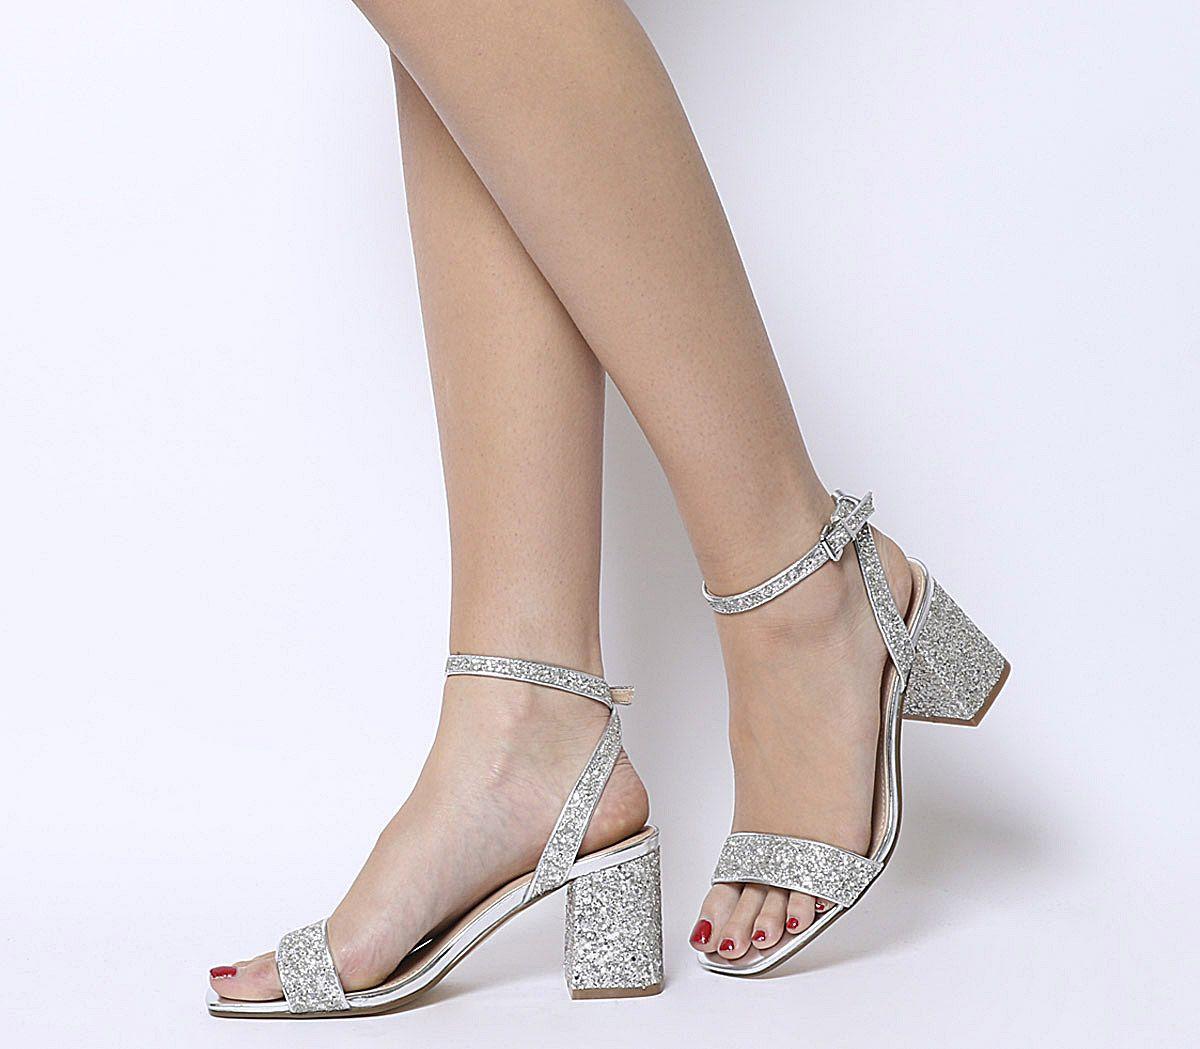 0a18d6f310f8 Office Millions Square Toe Two Part Heels Silver Glitter - Mid Heels